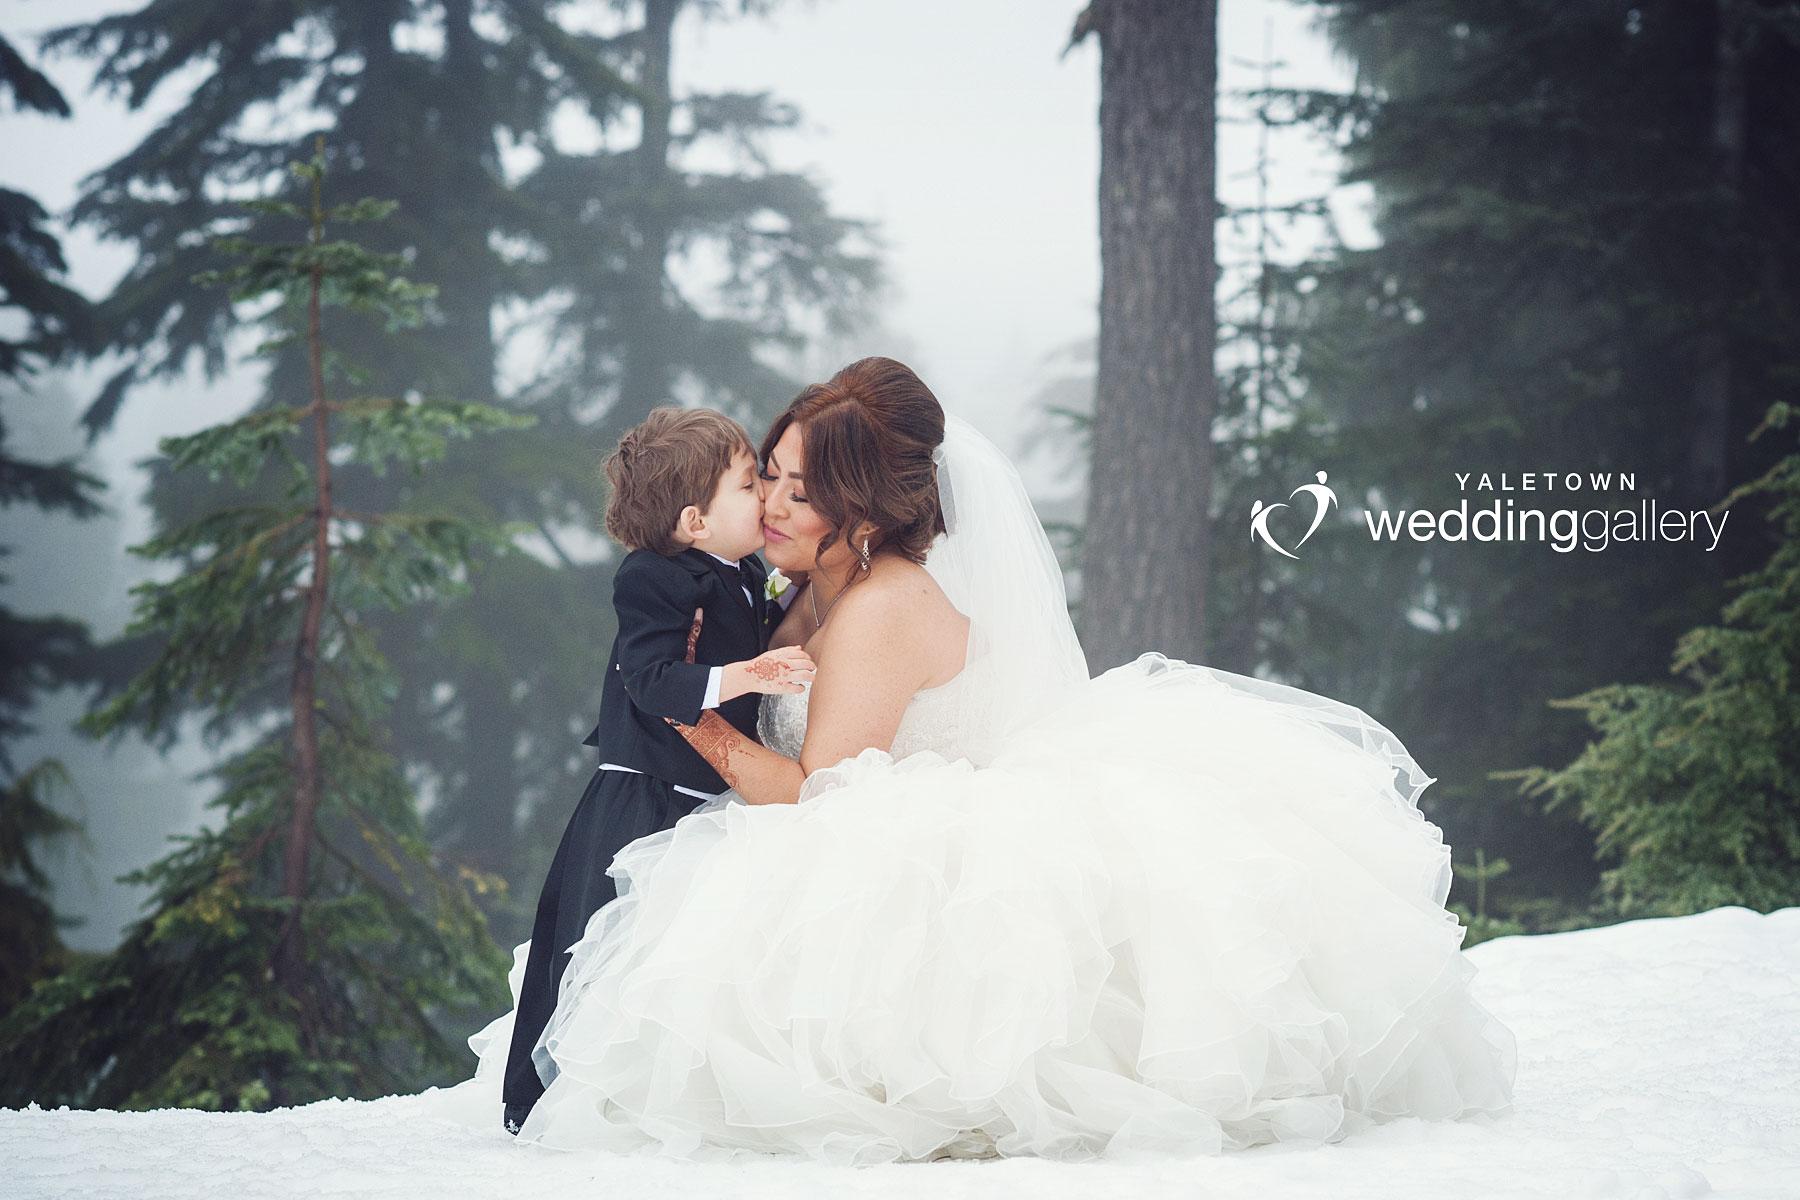 Grouse_Mountain_Yaletown_Wedding_Gallery_photo.jpg